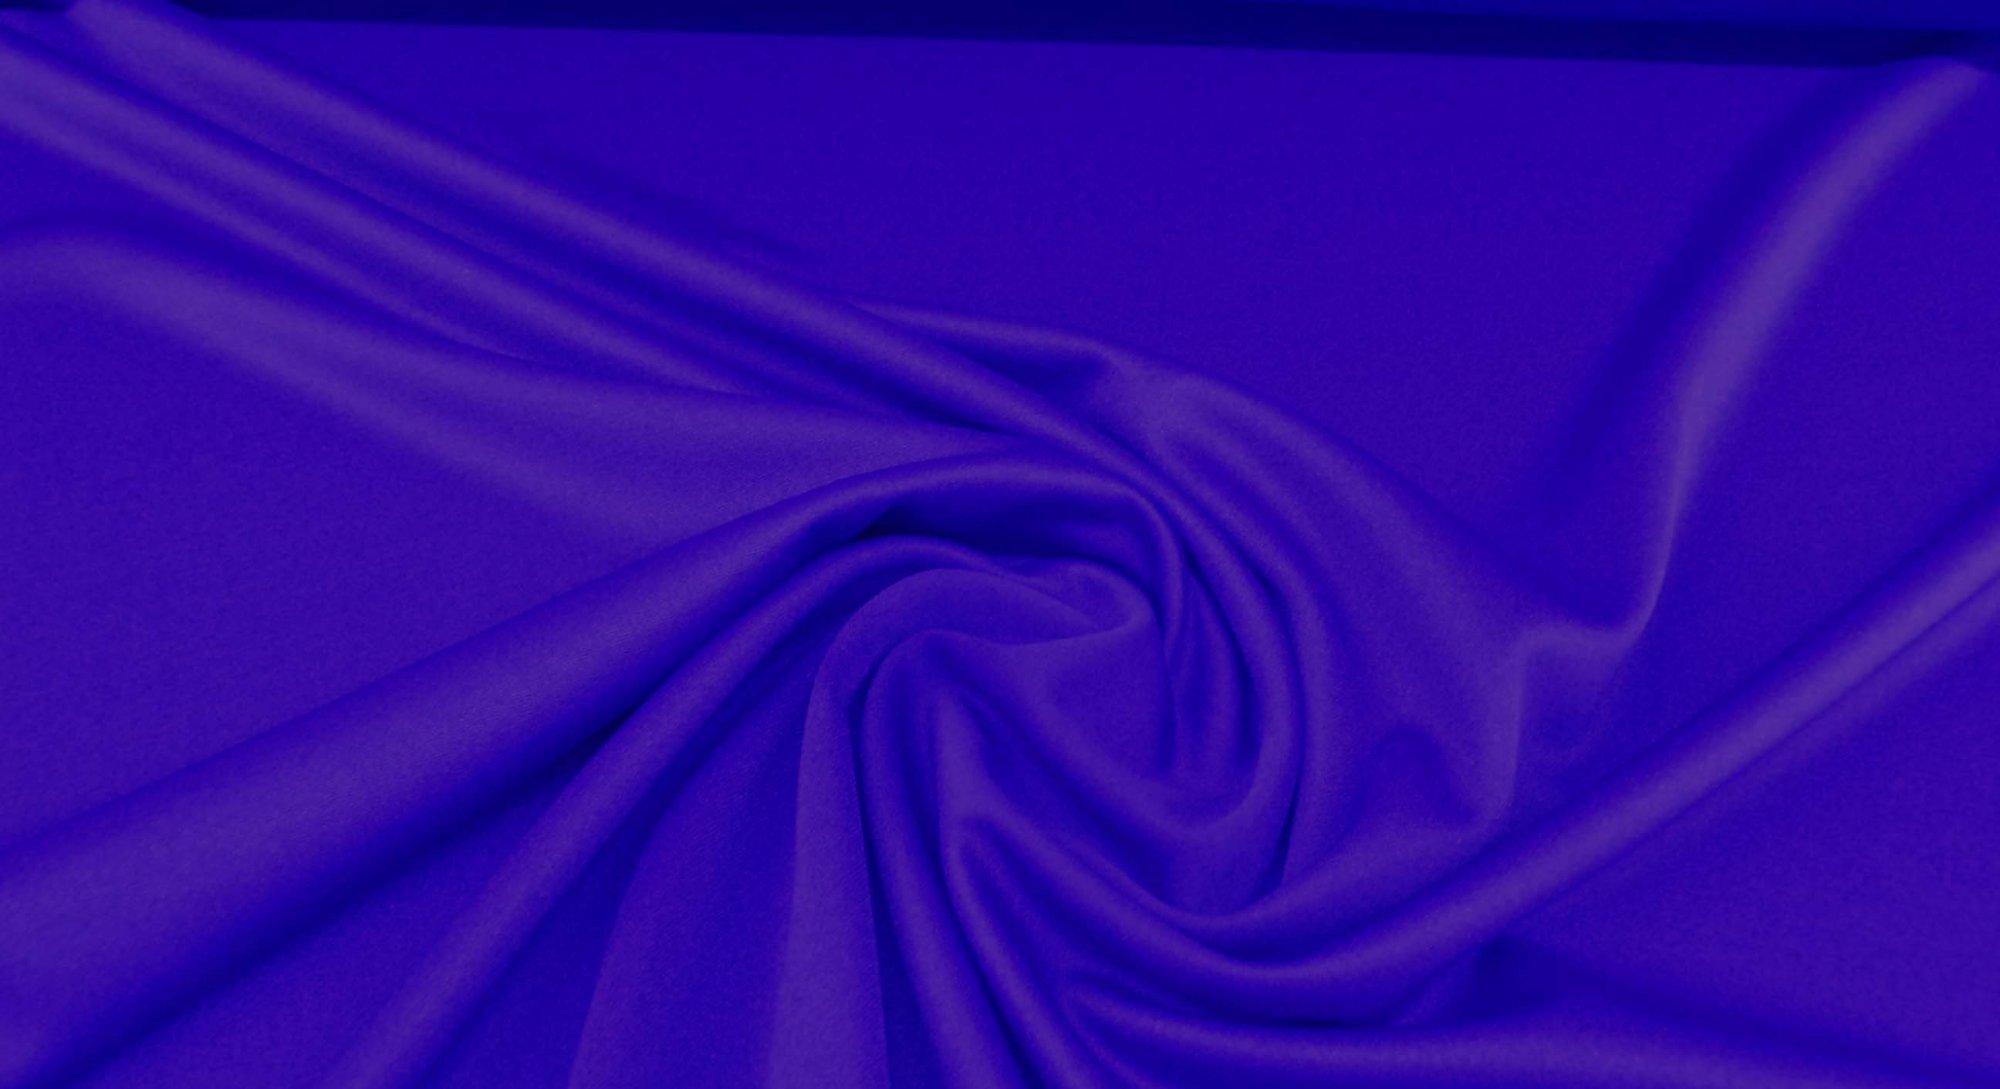 Purple Ponte (Scuba) Knit - 8 oz - 58in